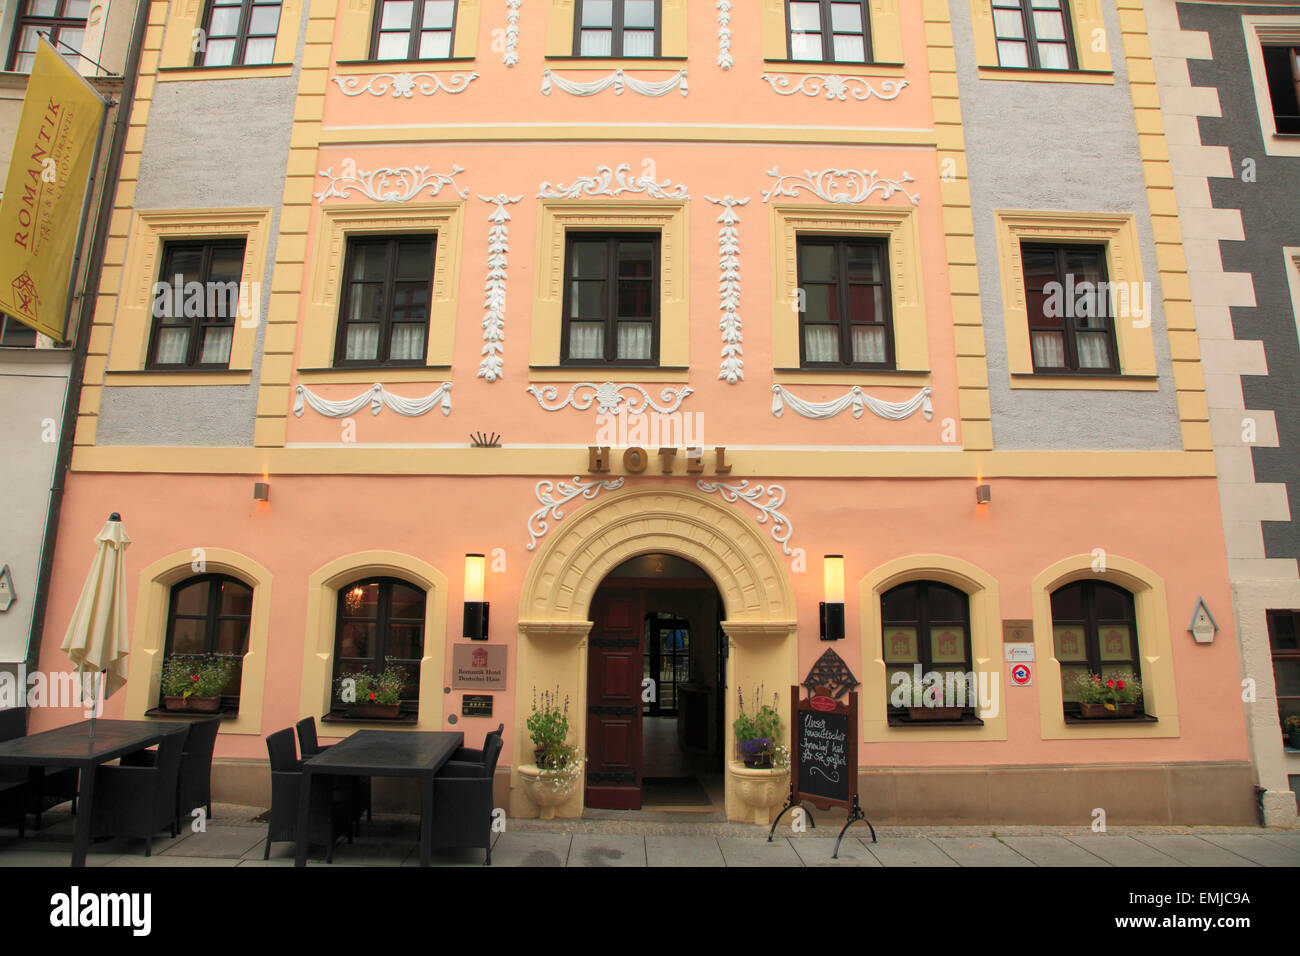 Germany, Saxony, Pirna, Romantik Hotel Deutsches Haus, - Stock Image